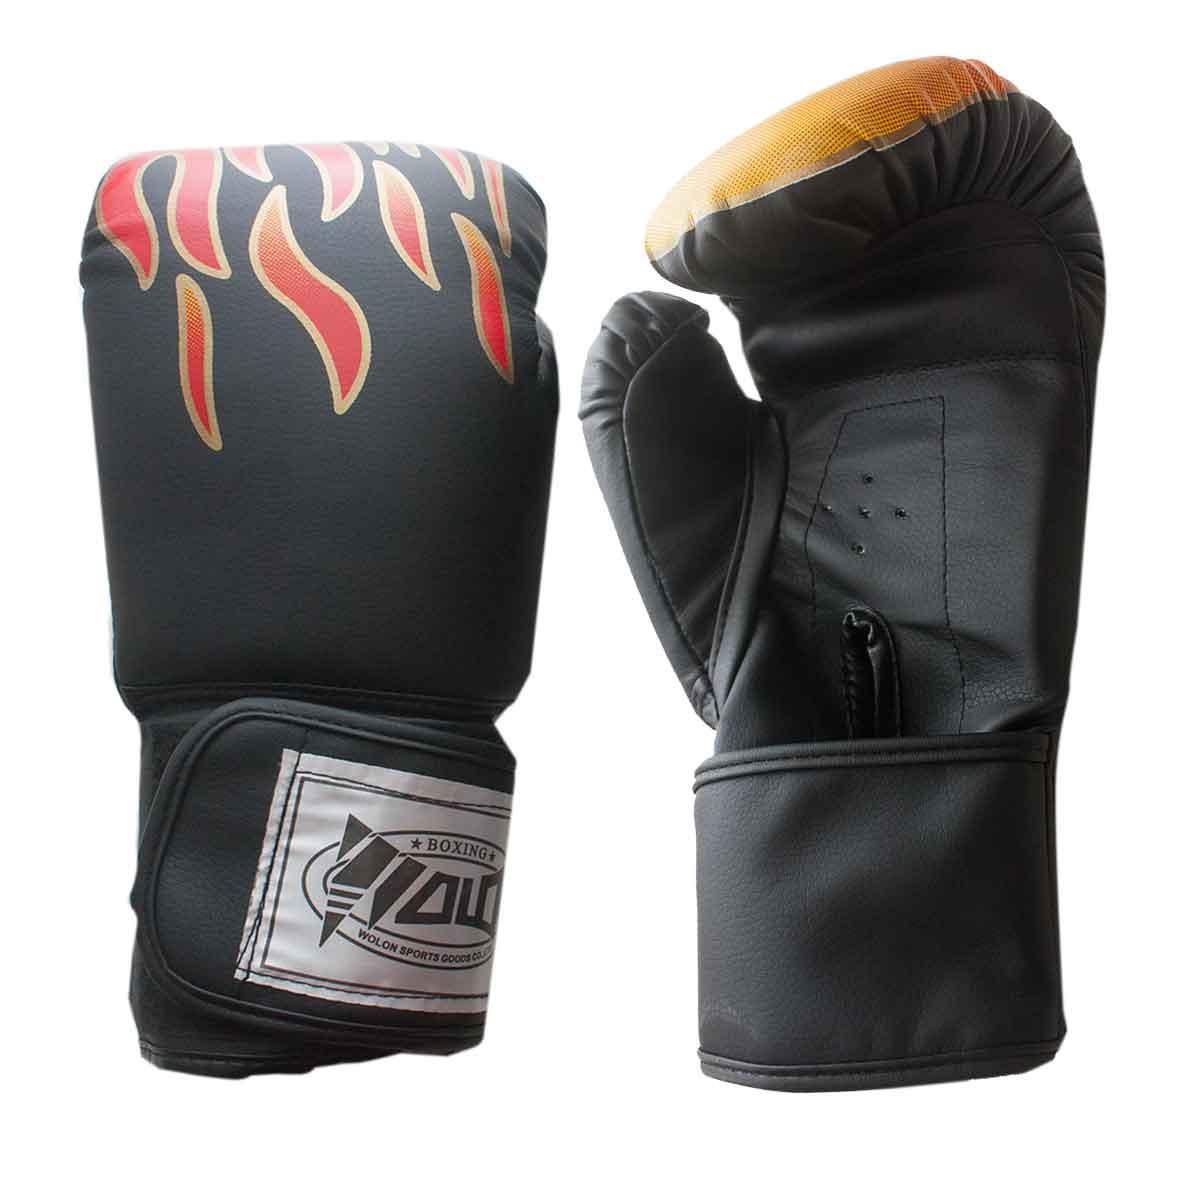 Par Luva Boxe Muay Thai Fogo Profissional Par Soco Bate Treino